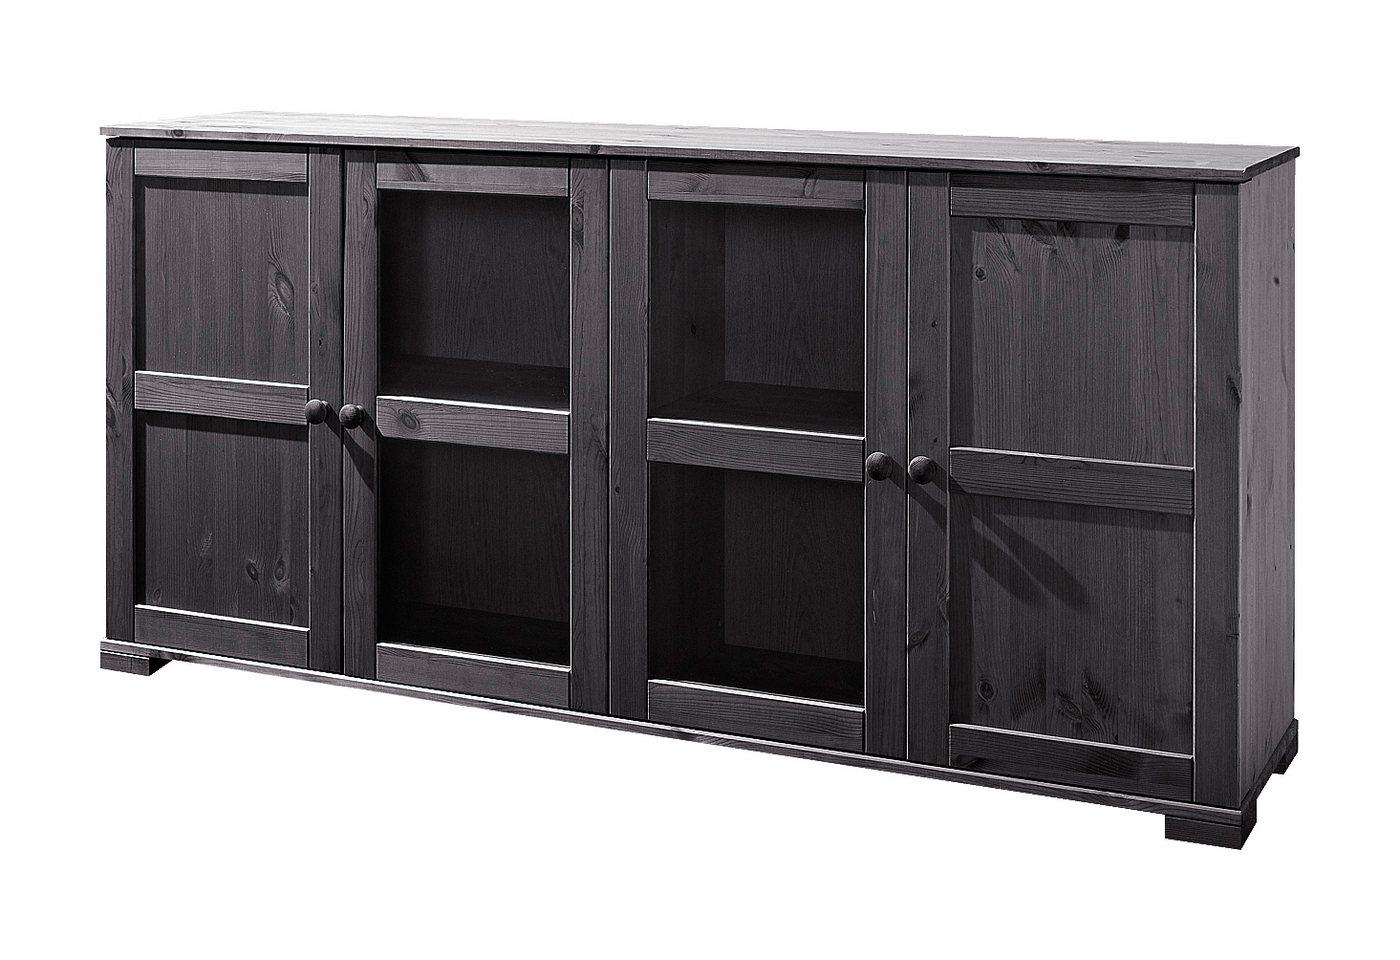 HOME AFFAIRE dressoir, breedte 166 cm, hoogte 79 cm